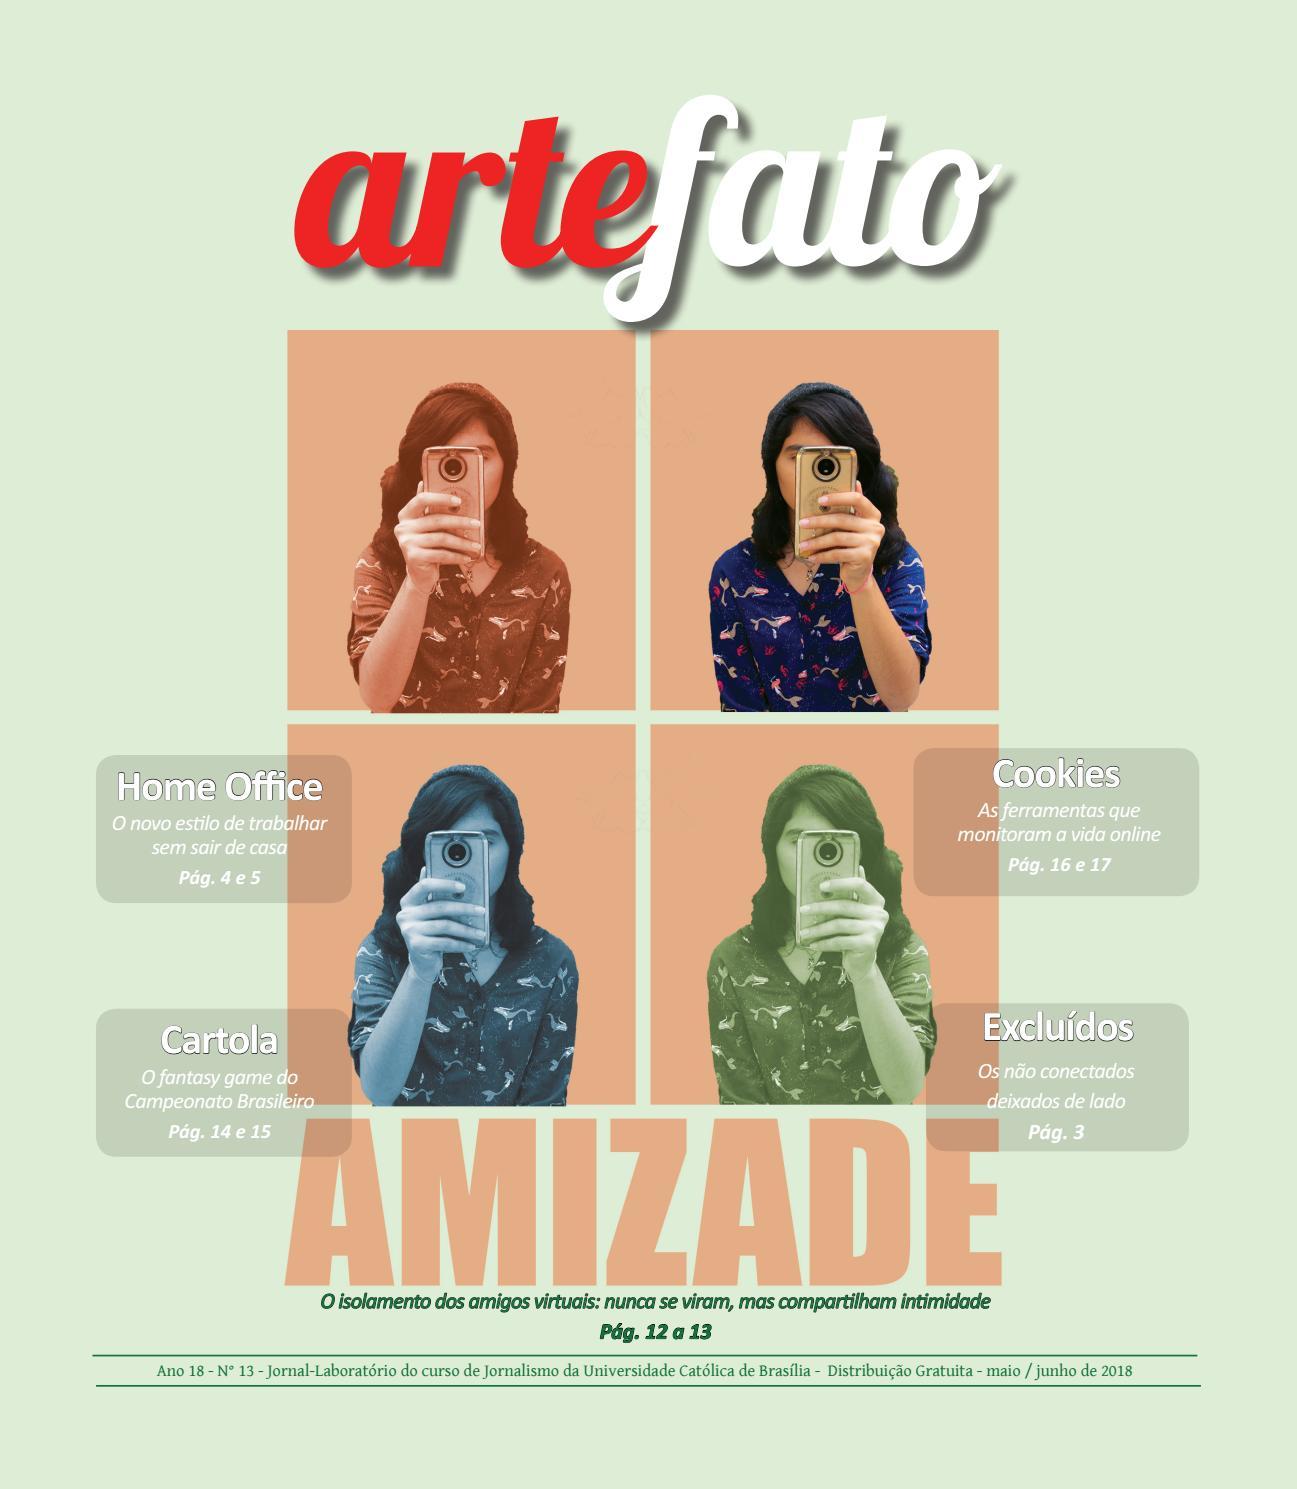 e7d4806f3b9b6 Jornal Artefato 02 2018 by Jornal-Laboratório Artefato - issuu